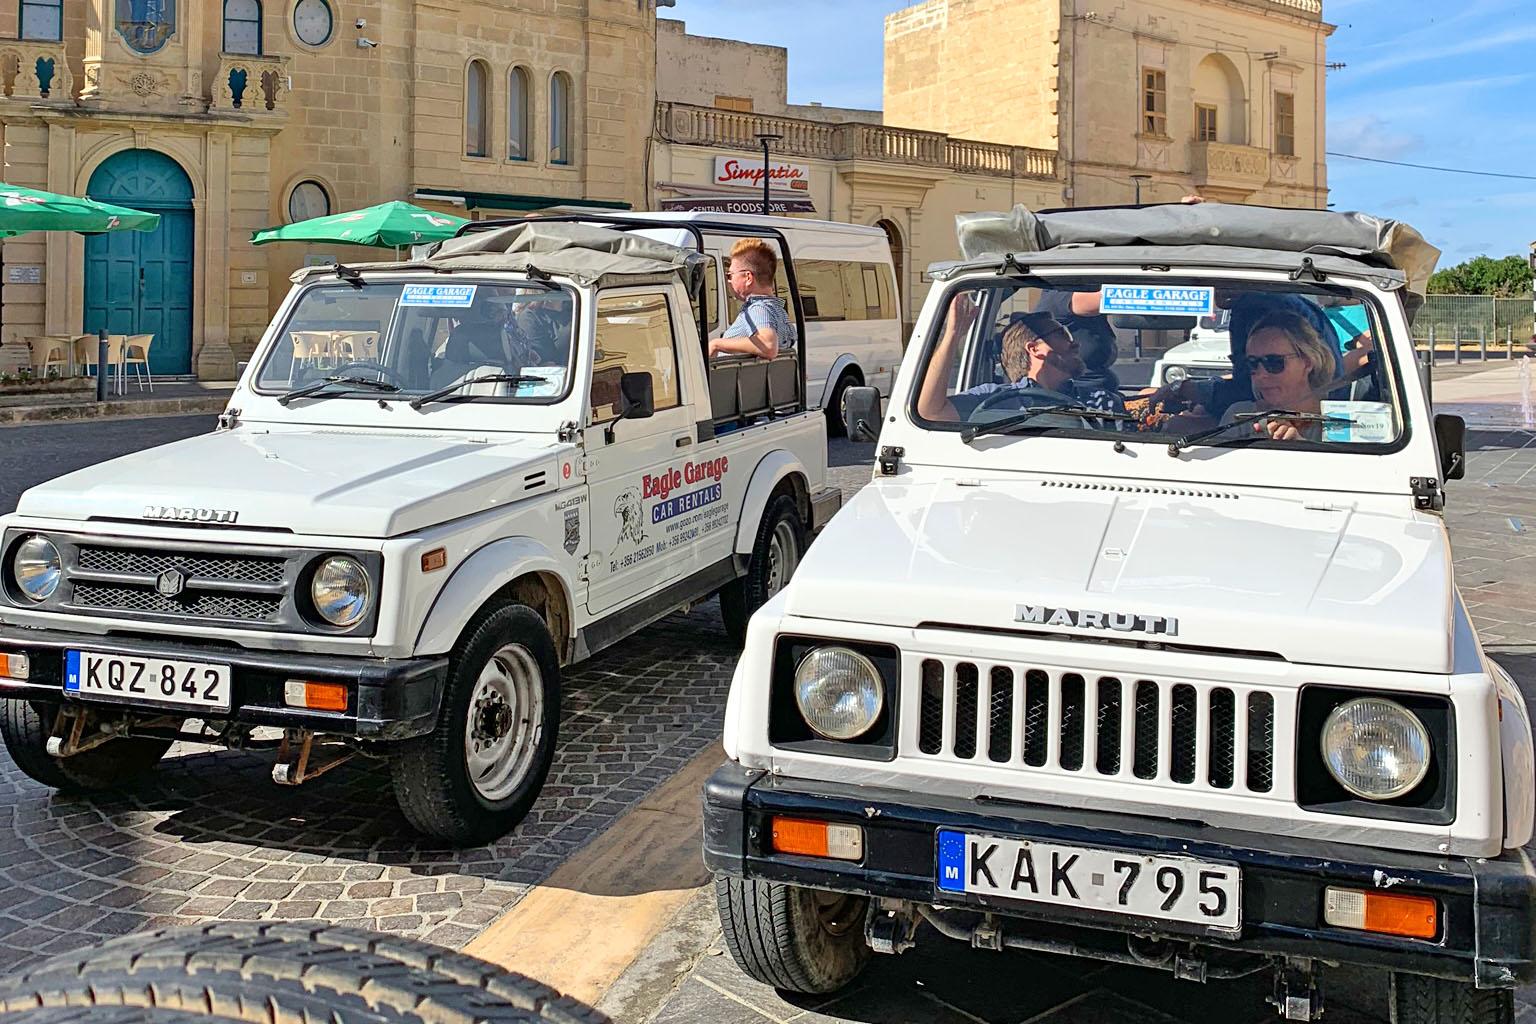 schareinprojekt-incentive-team-teamwork-sport-spass-teambuilding-zusammenhalt-reise-jeep-safari-malta